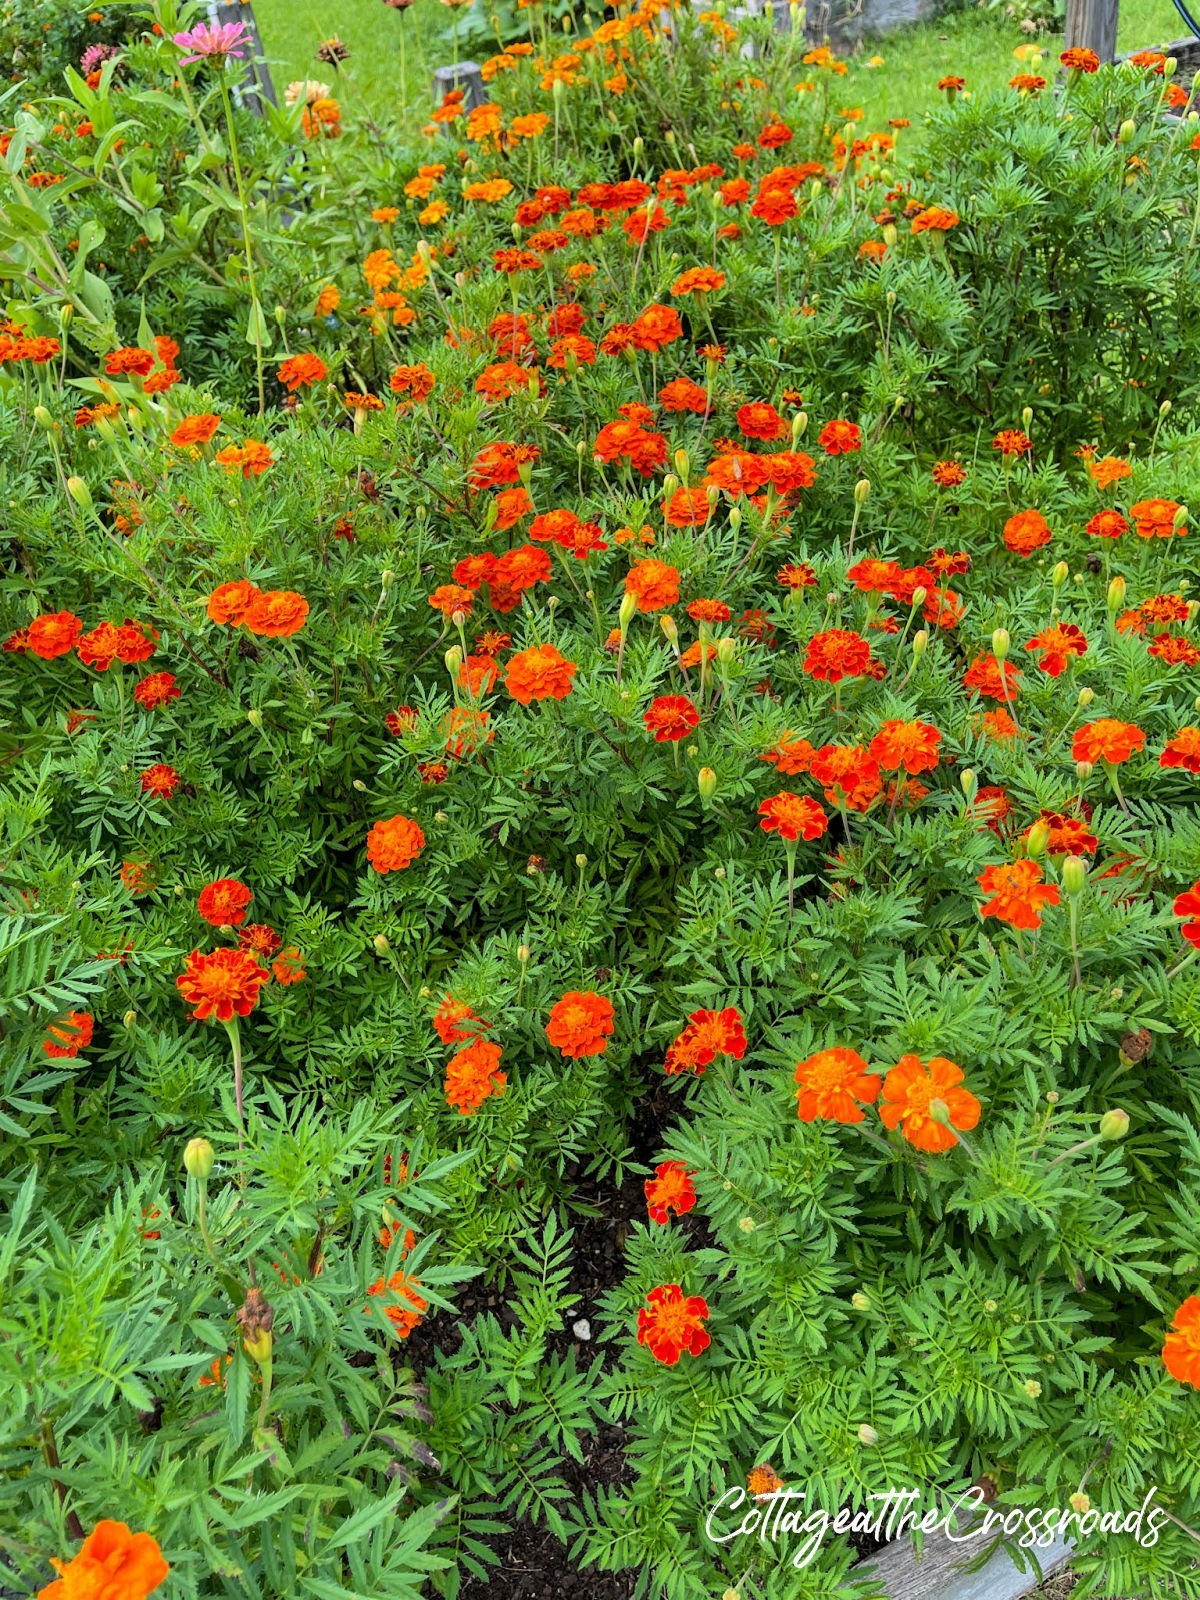 orange marigolds growing in a raised bed